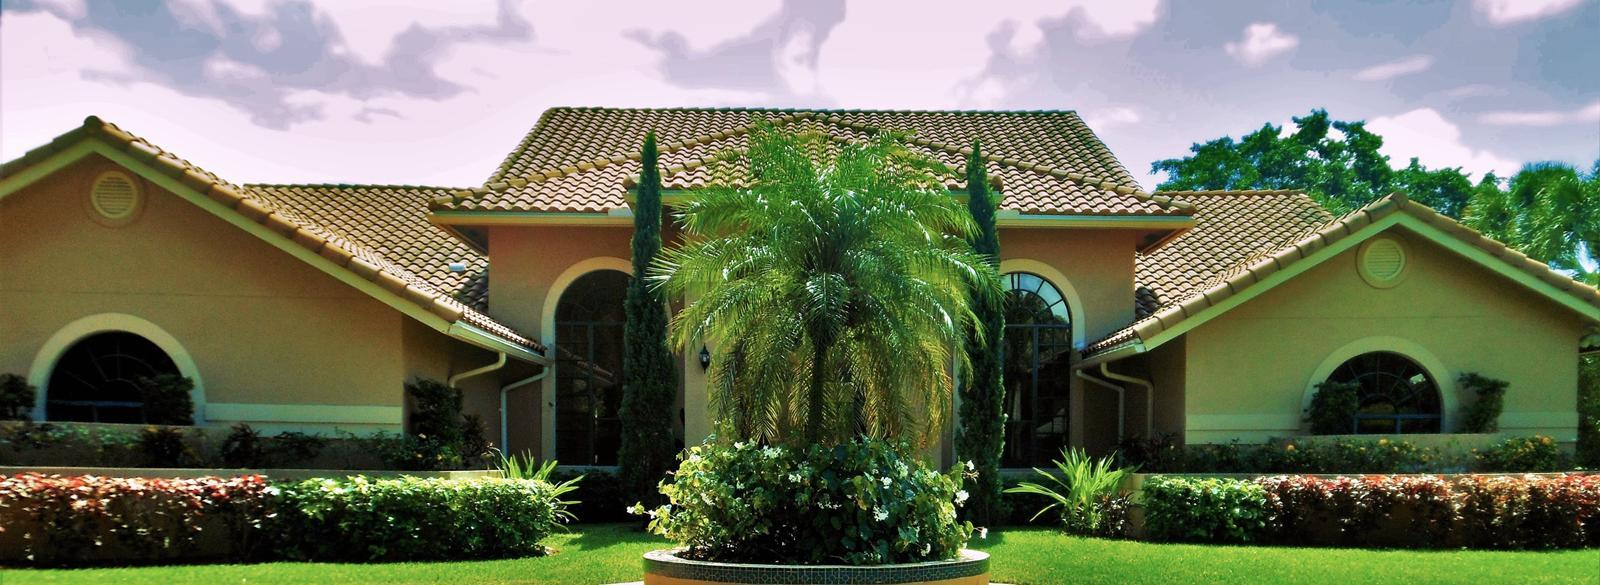 1080 Breakers West Way West Palm Beach, FL 33411